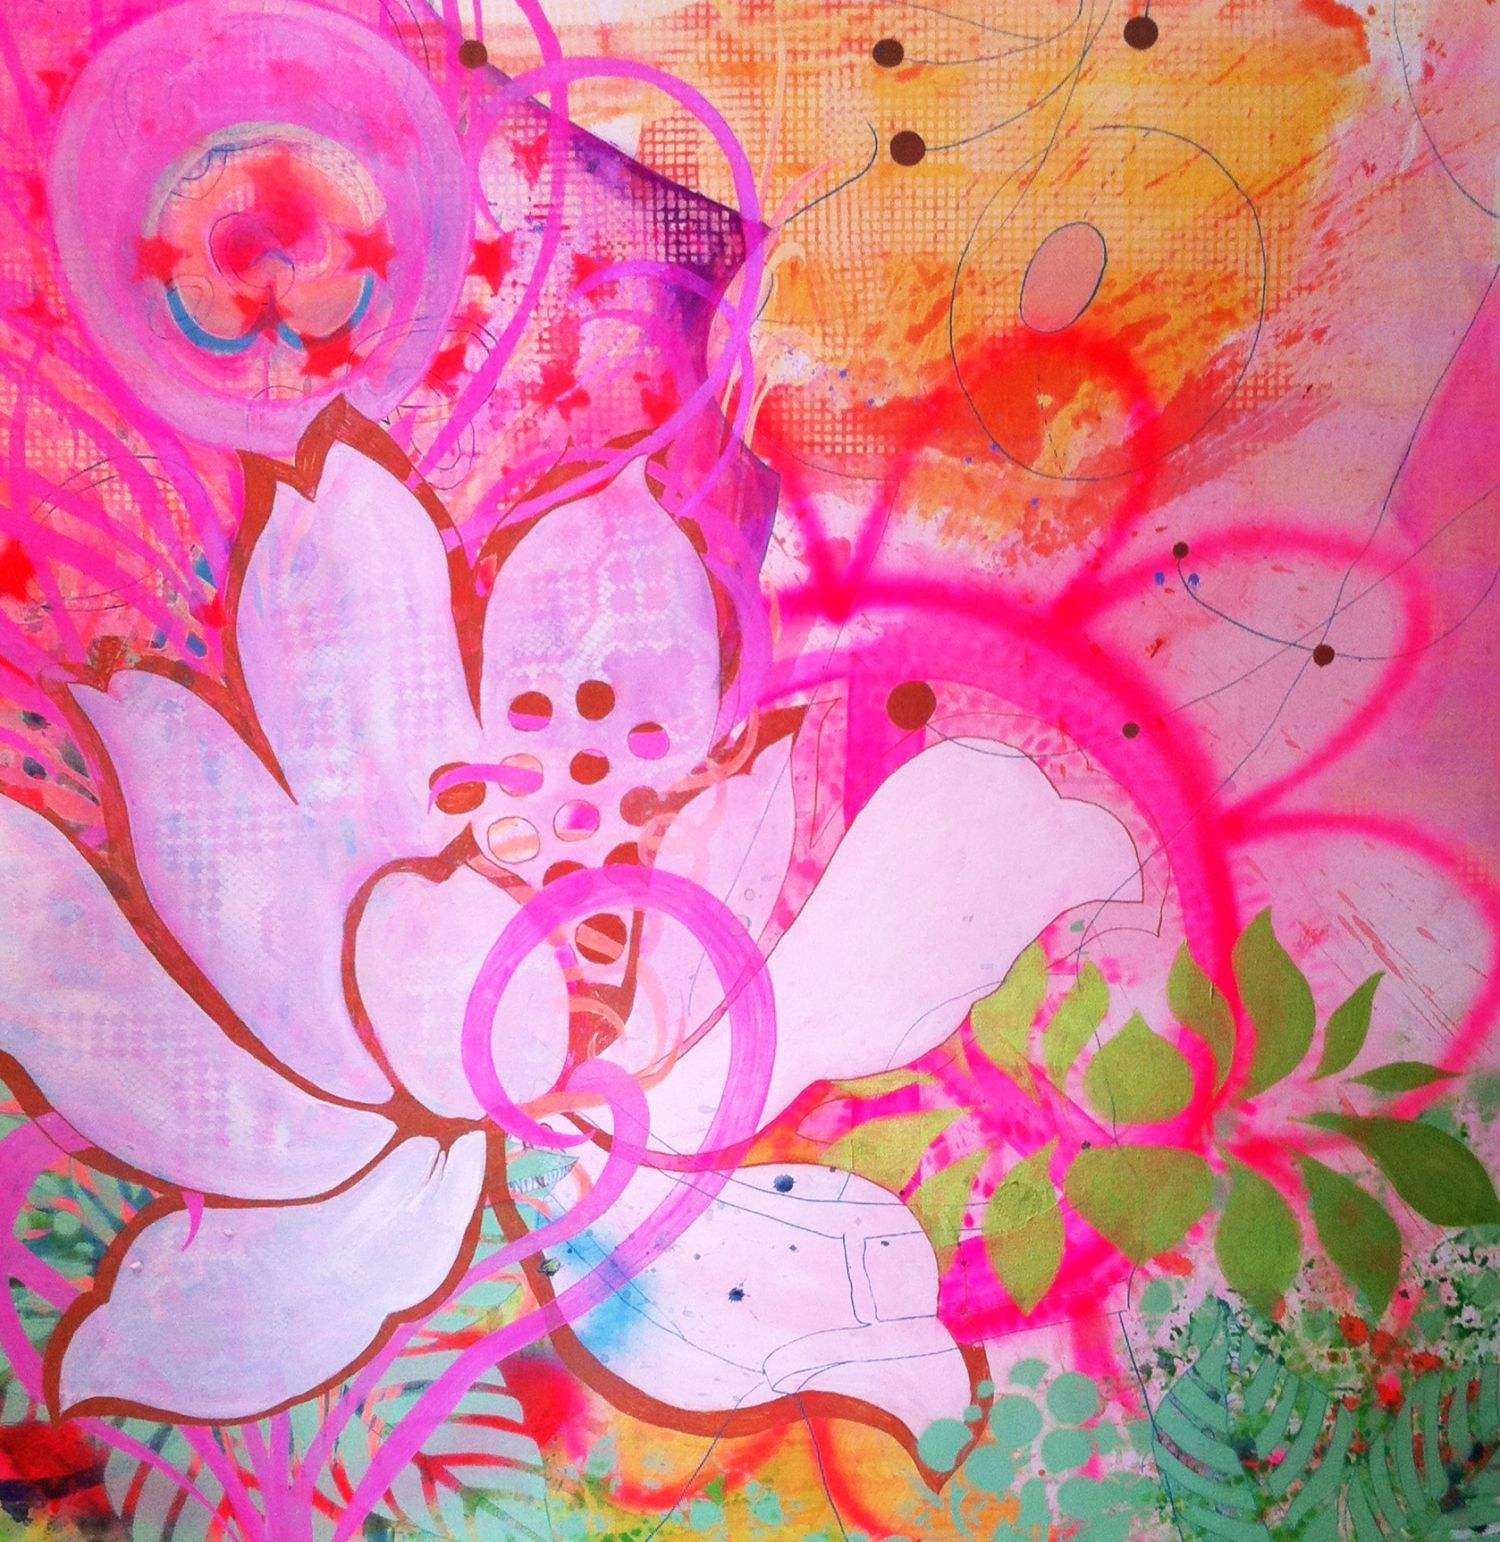 painting by Charlotte Clausen, DK   100cm x100 cm